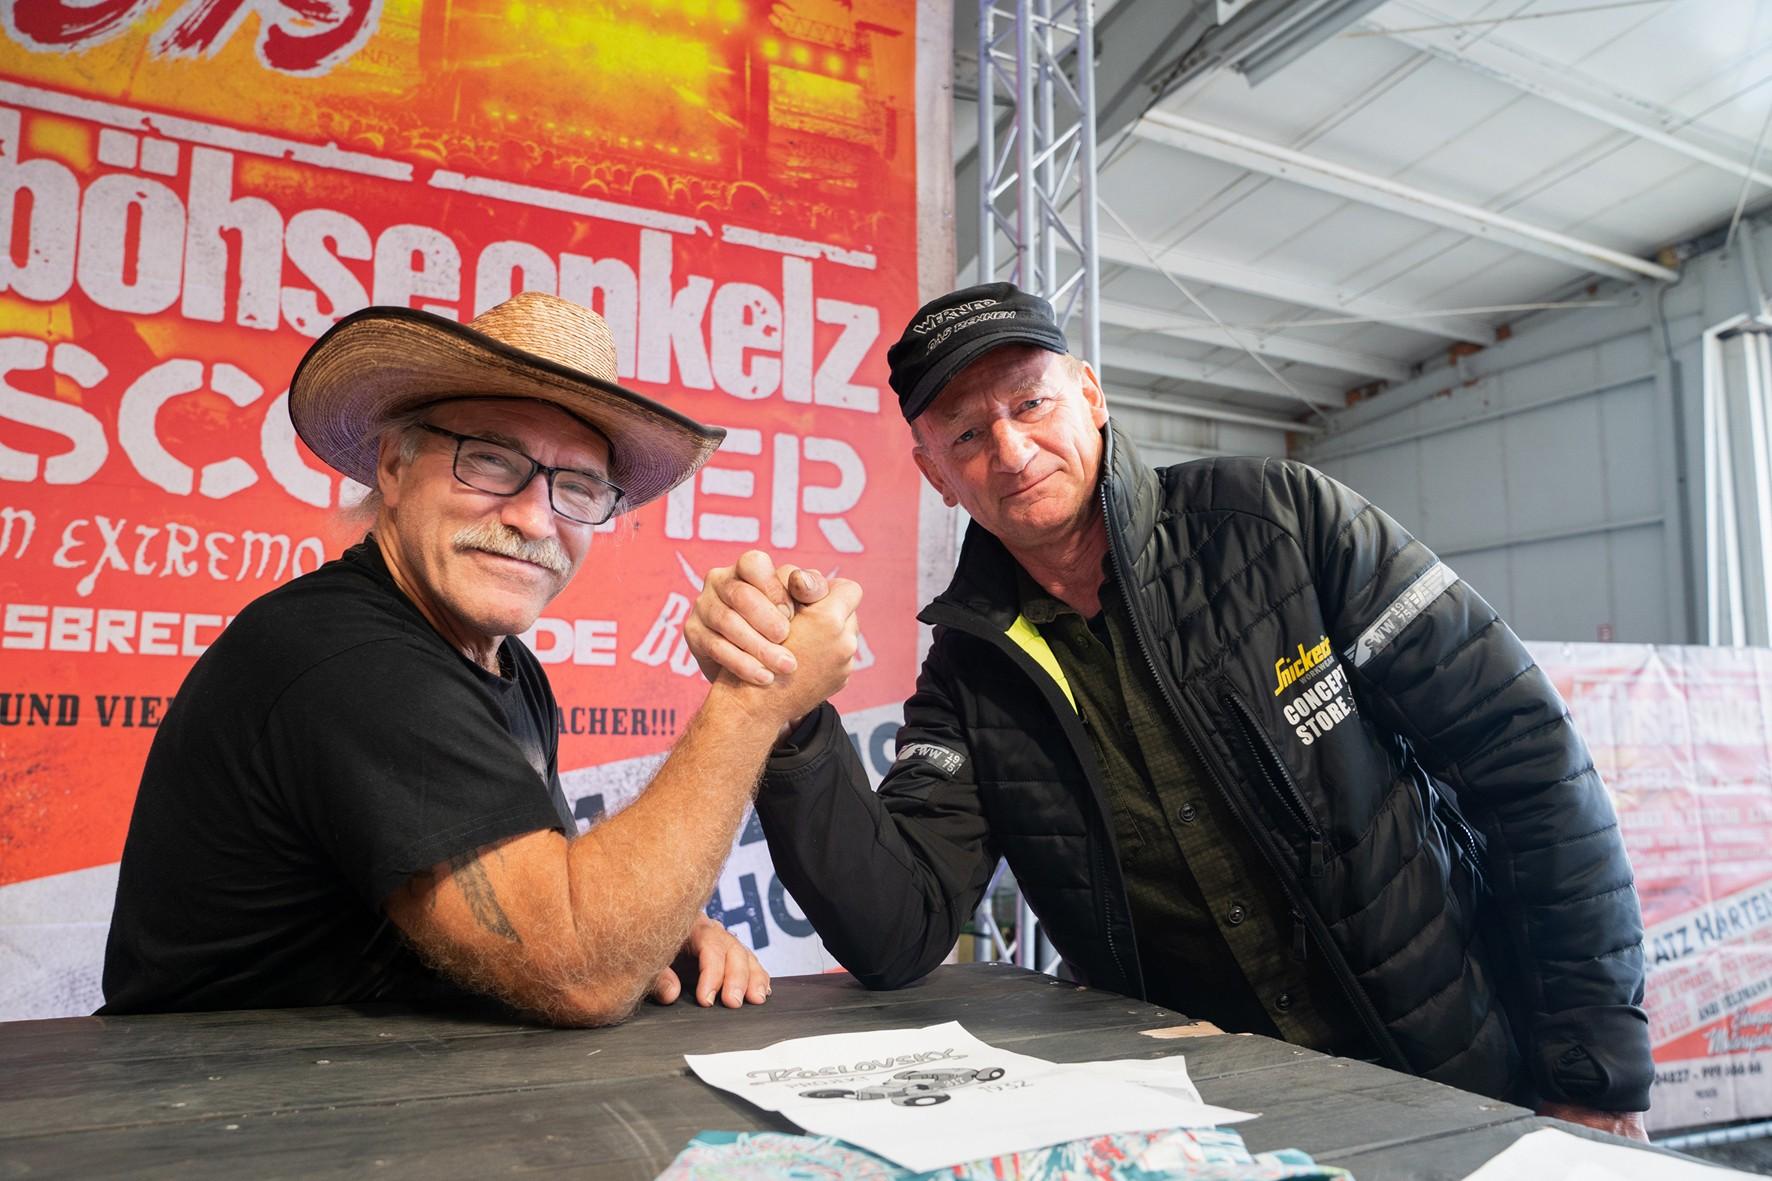 ©chrisemiljanssen - Festivals 2019 + Gewinne!